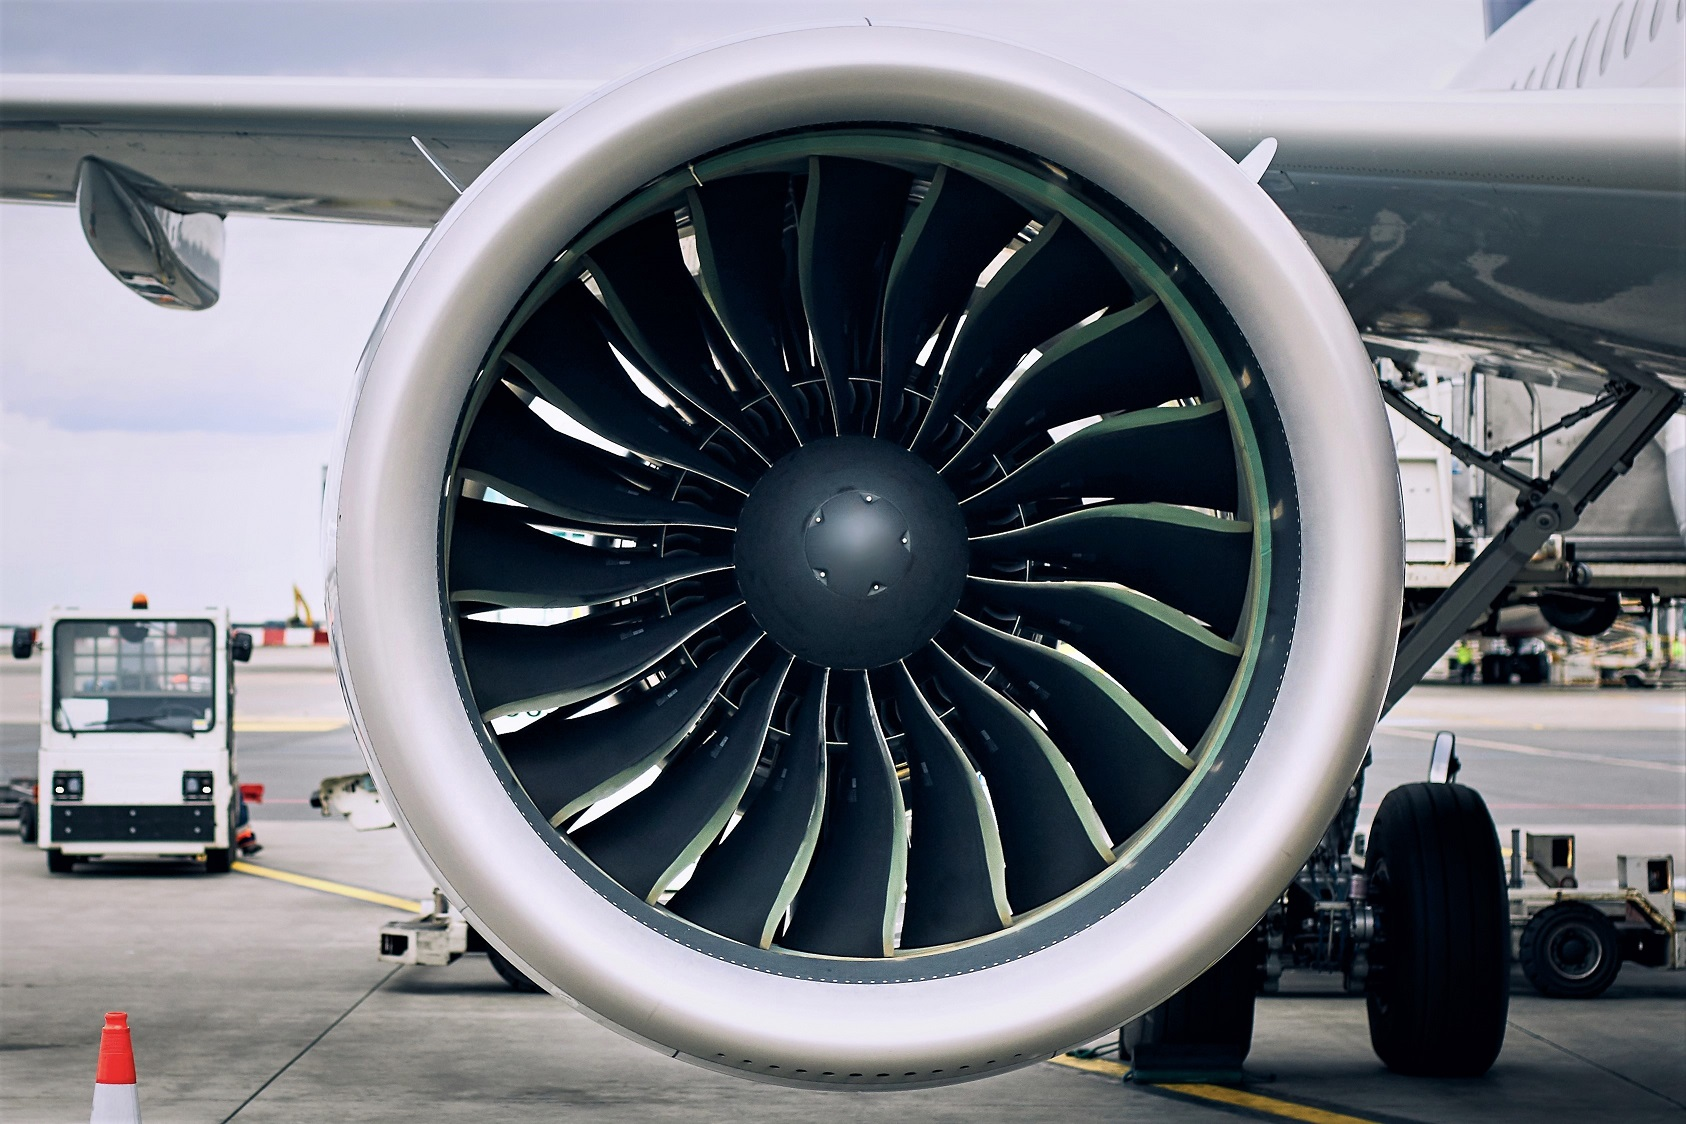 preparation of airplane before flight TXN7E5M #политика featured, авиасообщение, Грузия-Россия, Крым, санкции, Турция, украина, эмбарго